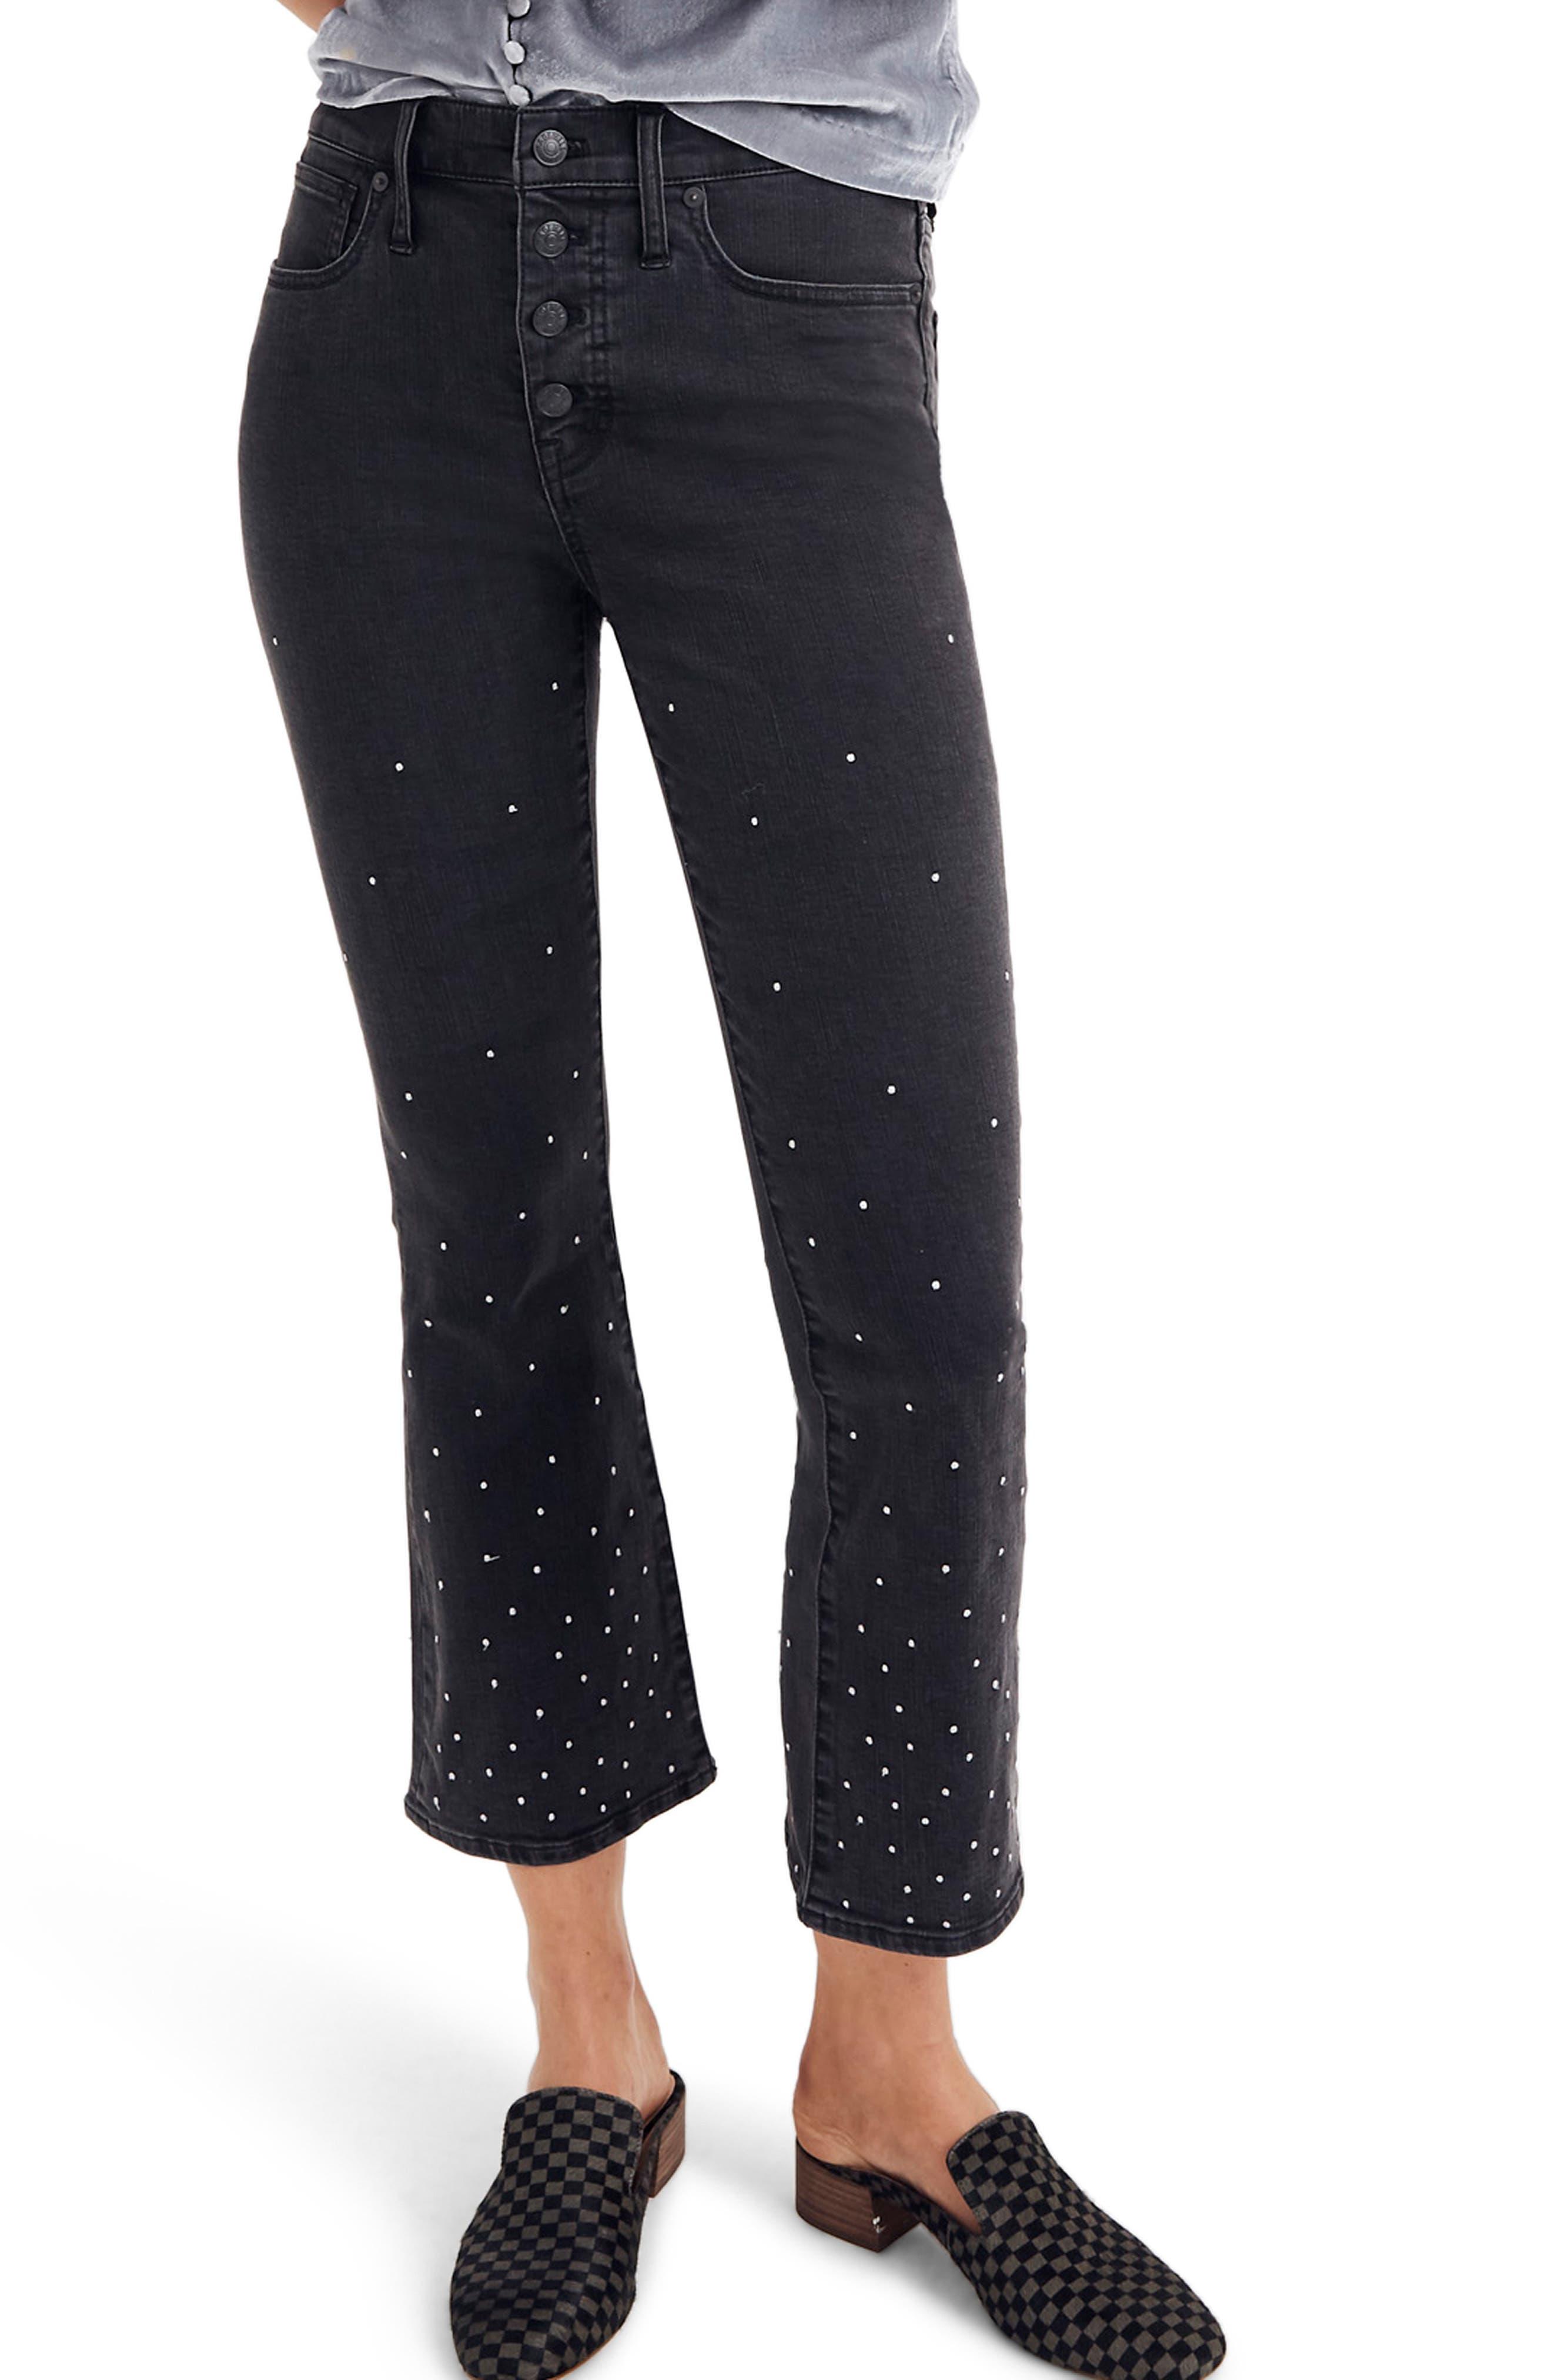 Cali Demi Boot Jeans,                             Main thumbnail 1, color,                             SILVER DOTS